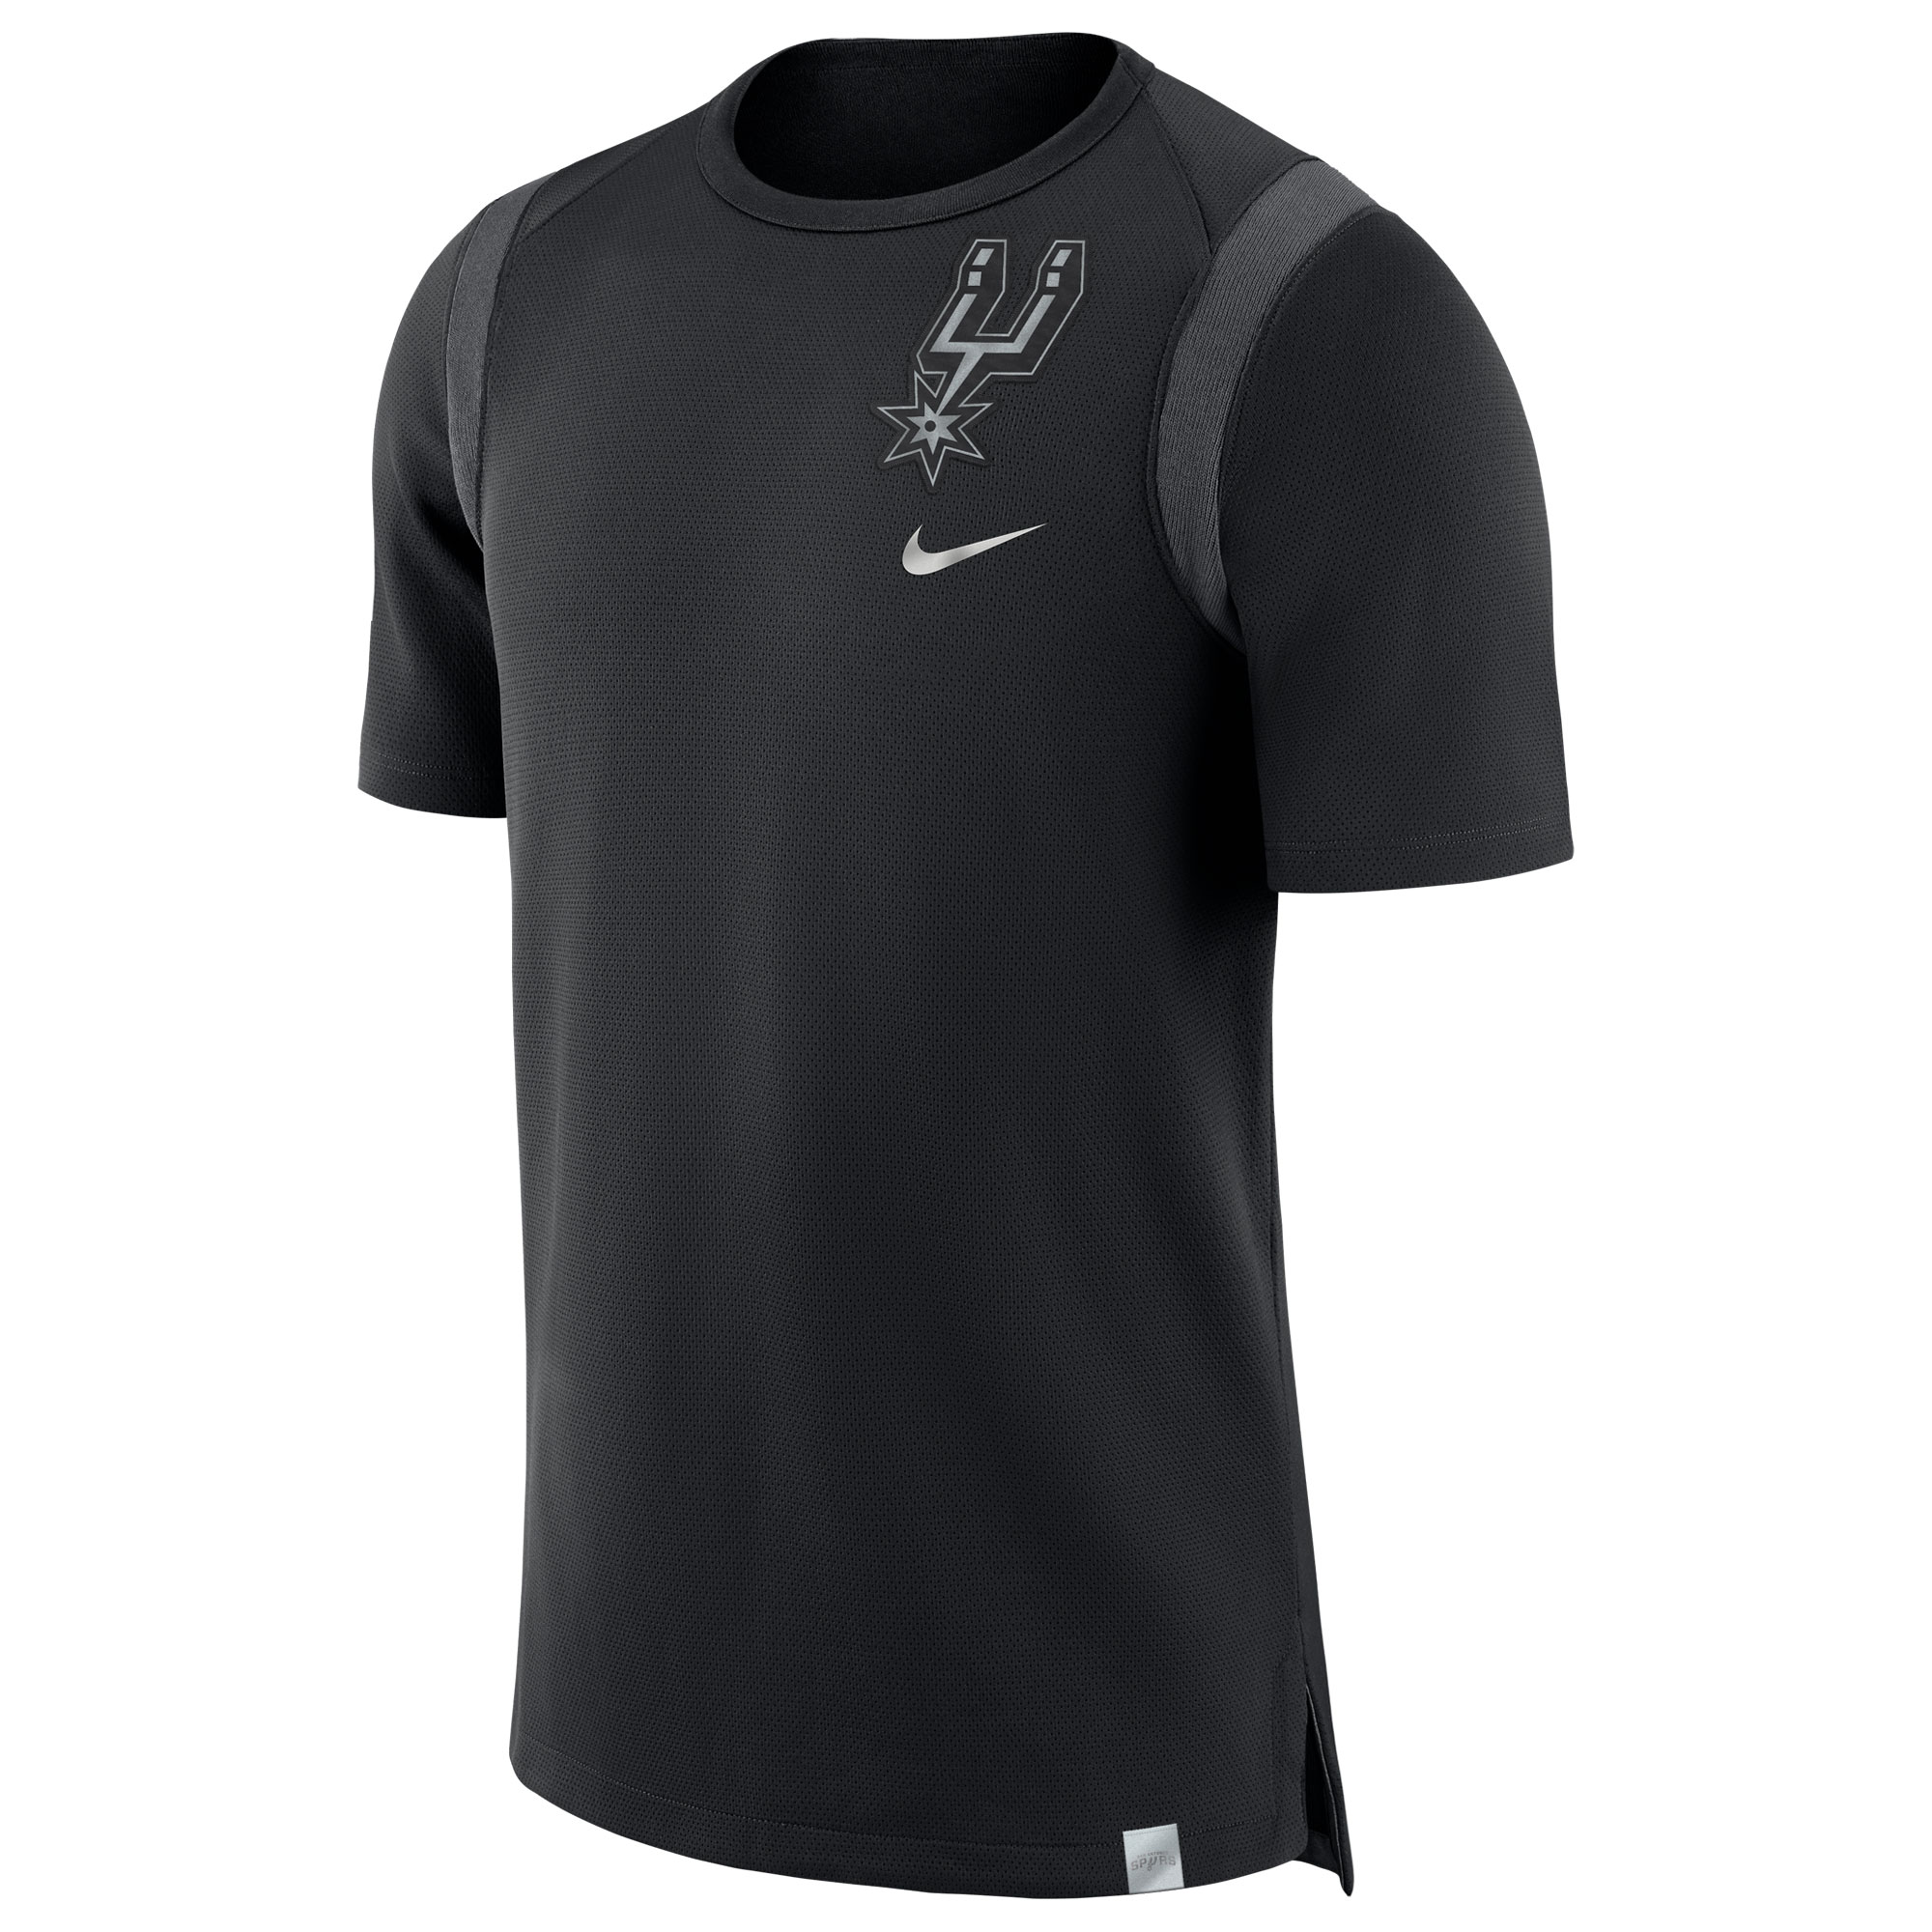 San Antonio Spurs Jordan Baller Short Sleeve Top - Negro Borrosa - Hombre